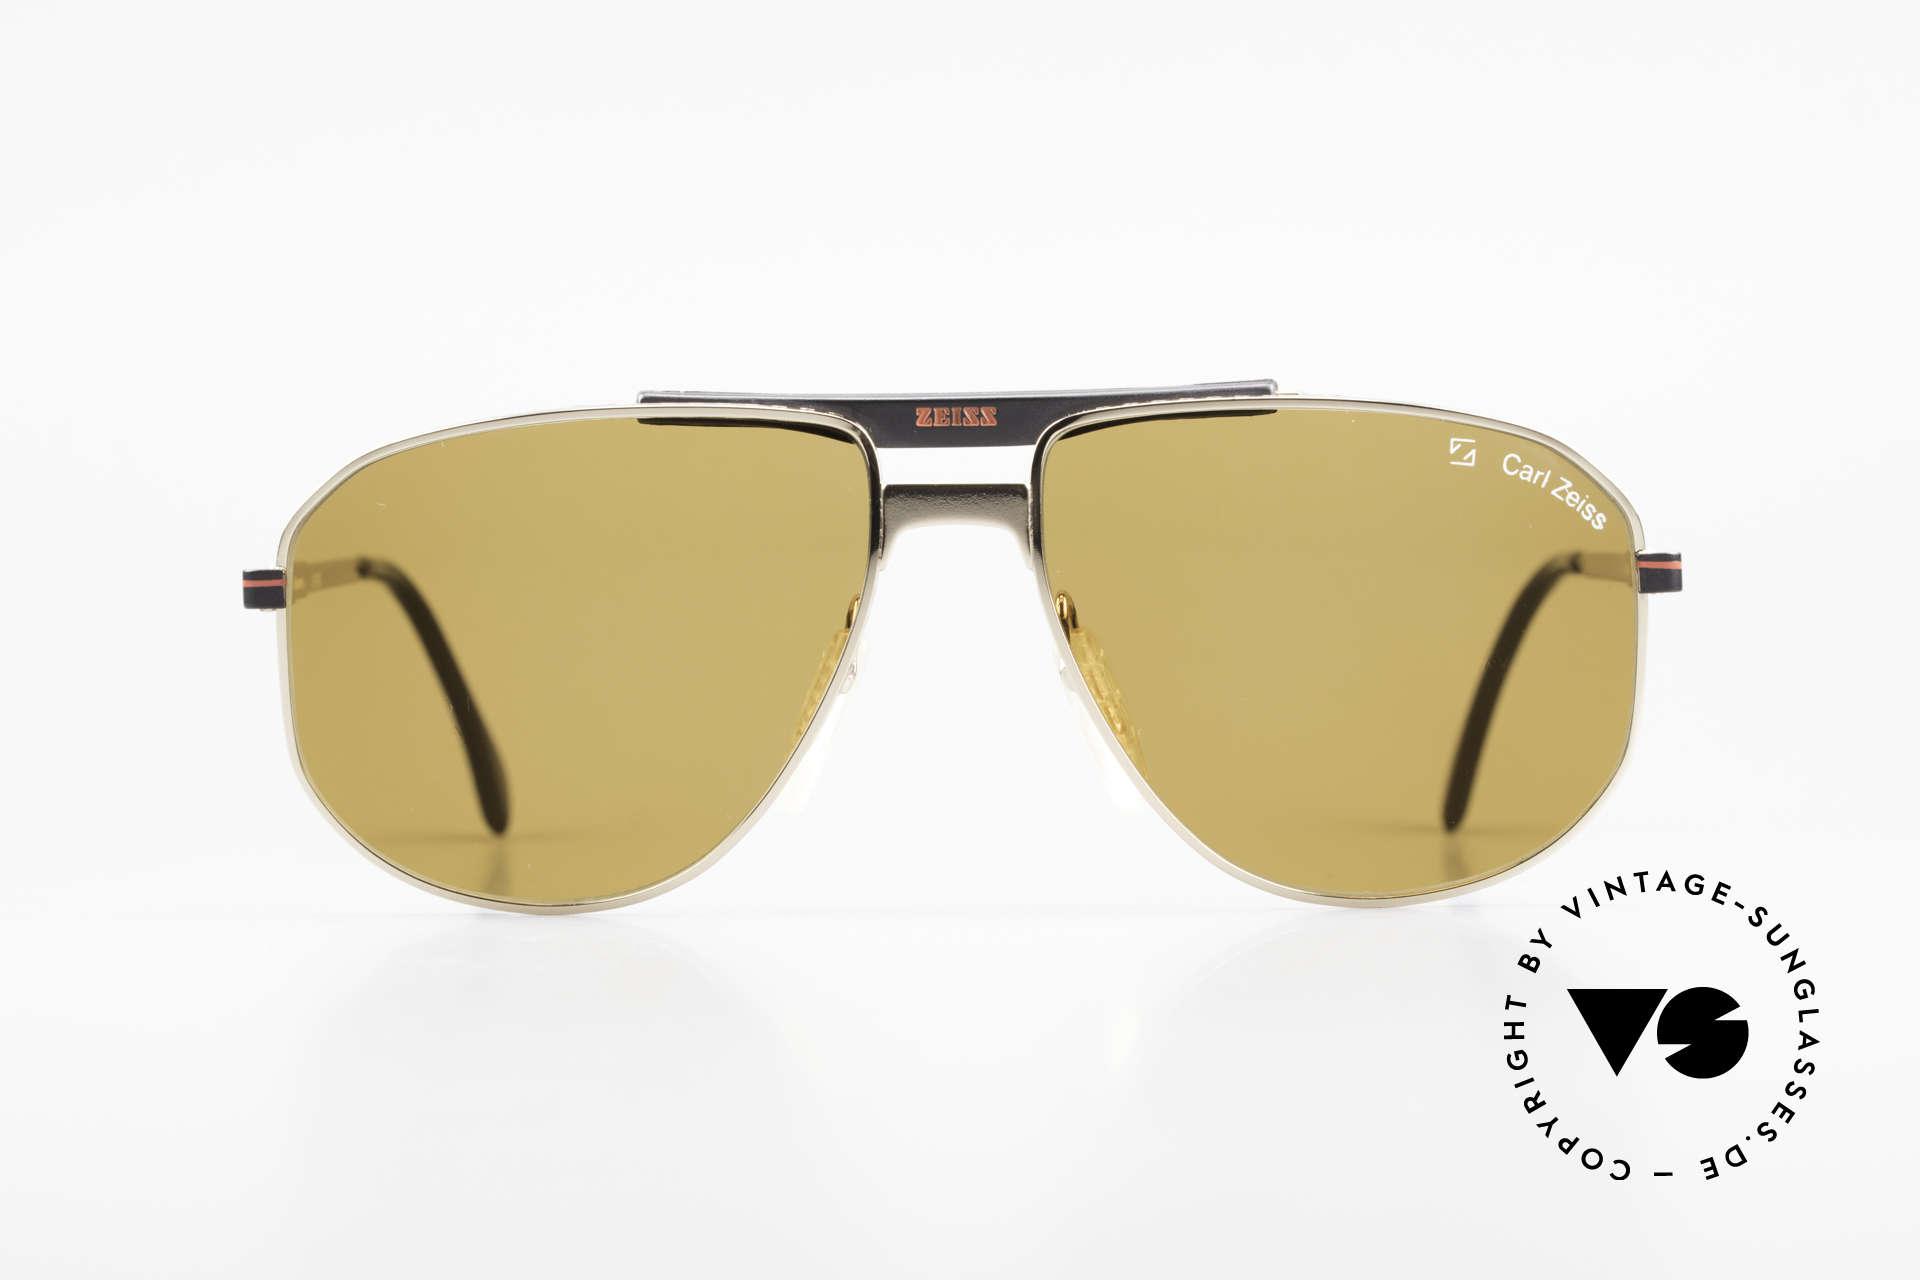 Zeiss 9934 90's True Vintage Sunglasses, non-reflecting sun lenses for 100% UV protection, Made for Men